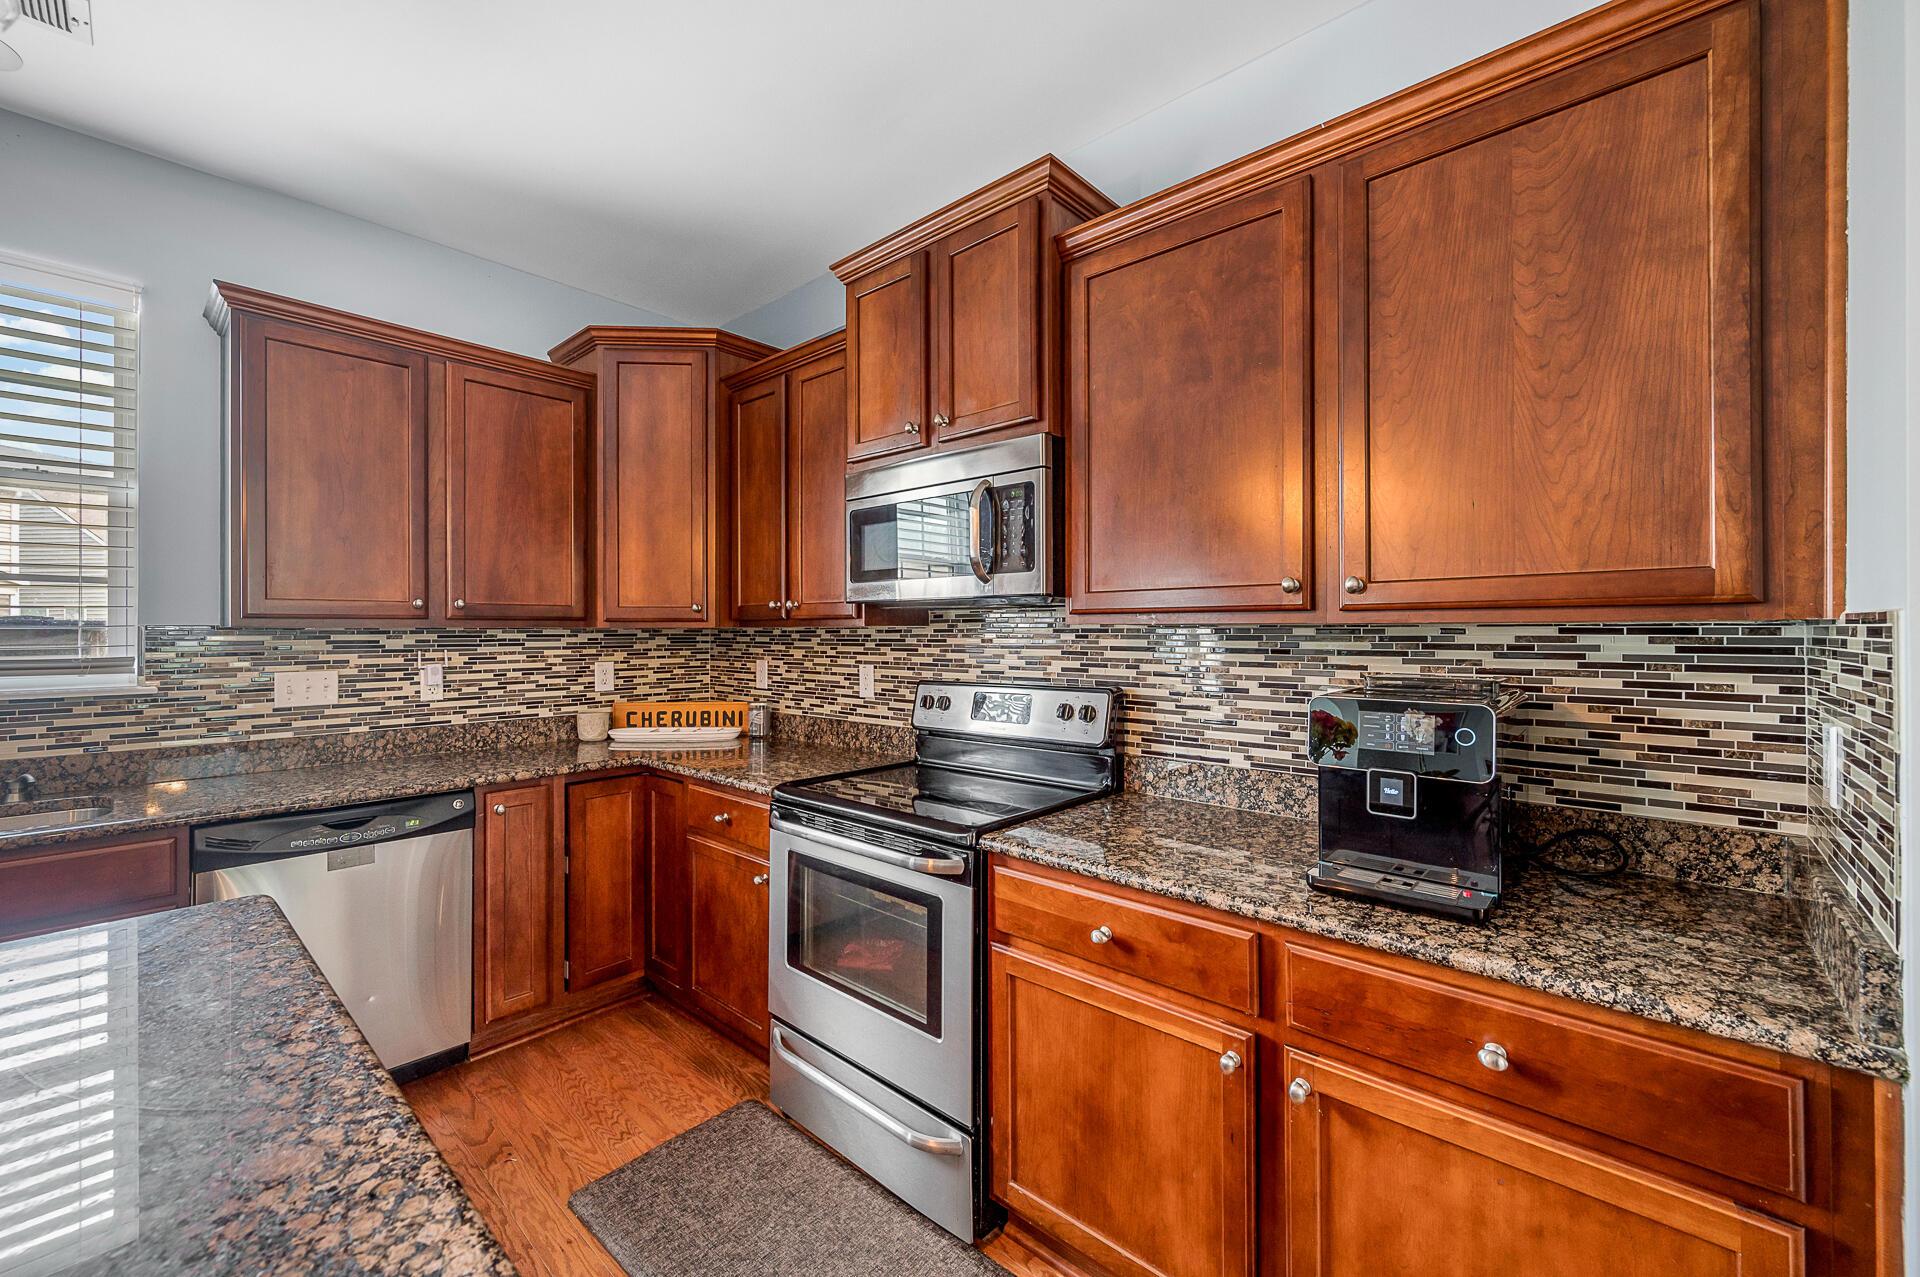 286 Pemberly Boulevard, Summerville, 29486, 6 Bedrooms Bedrooms, ,3 BathroomsBathrooms,Residential,For Sale,Pemberly,21024400